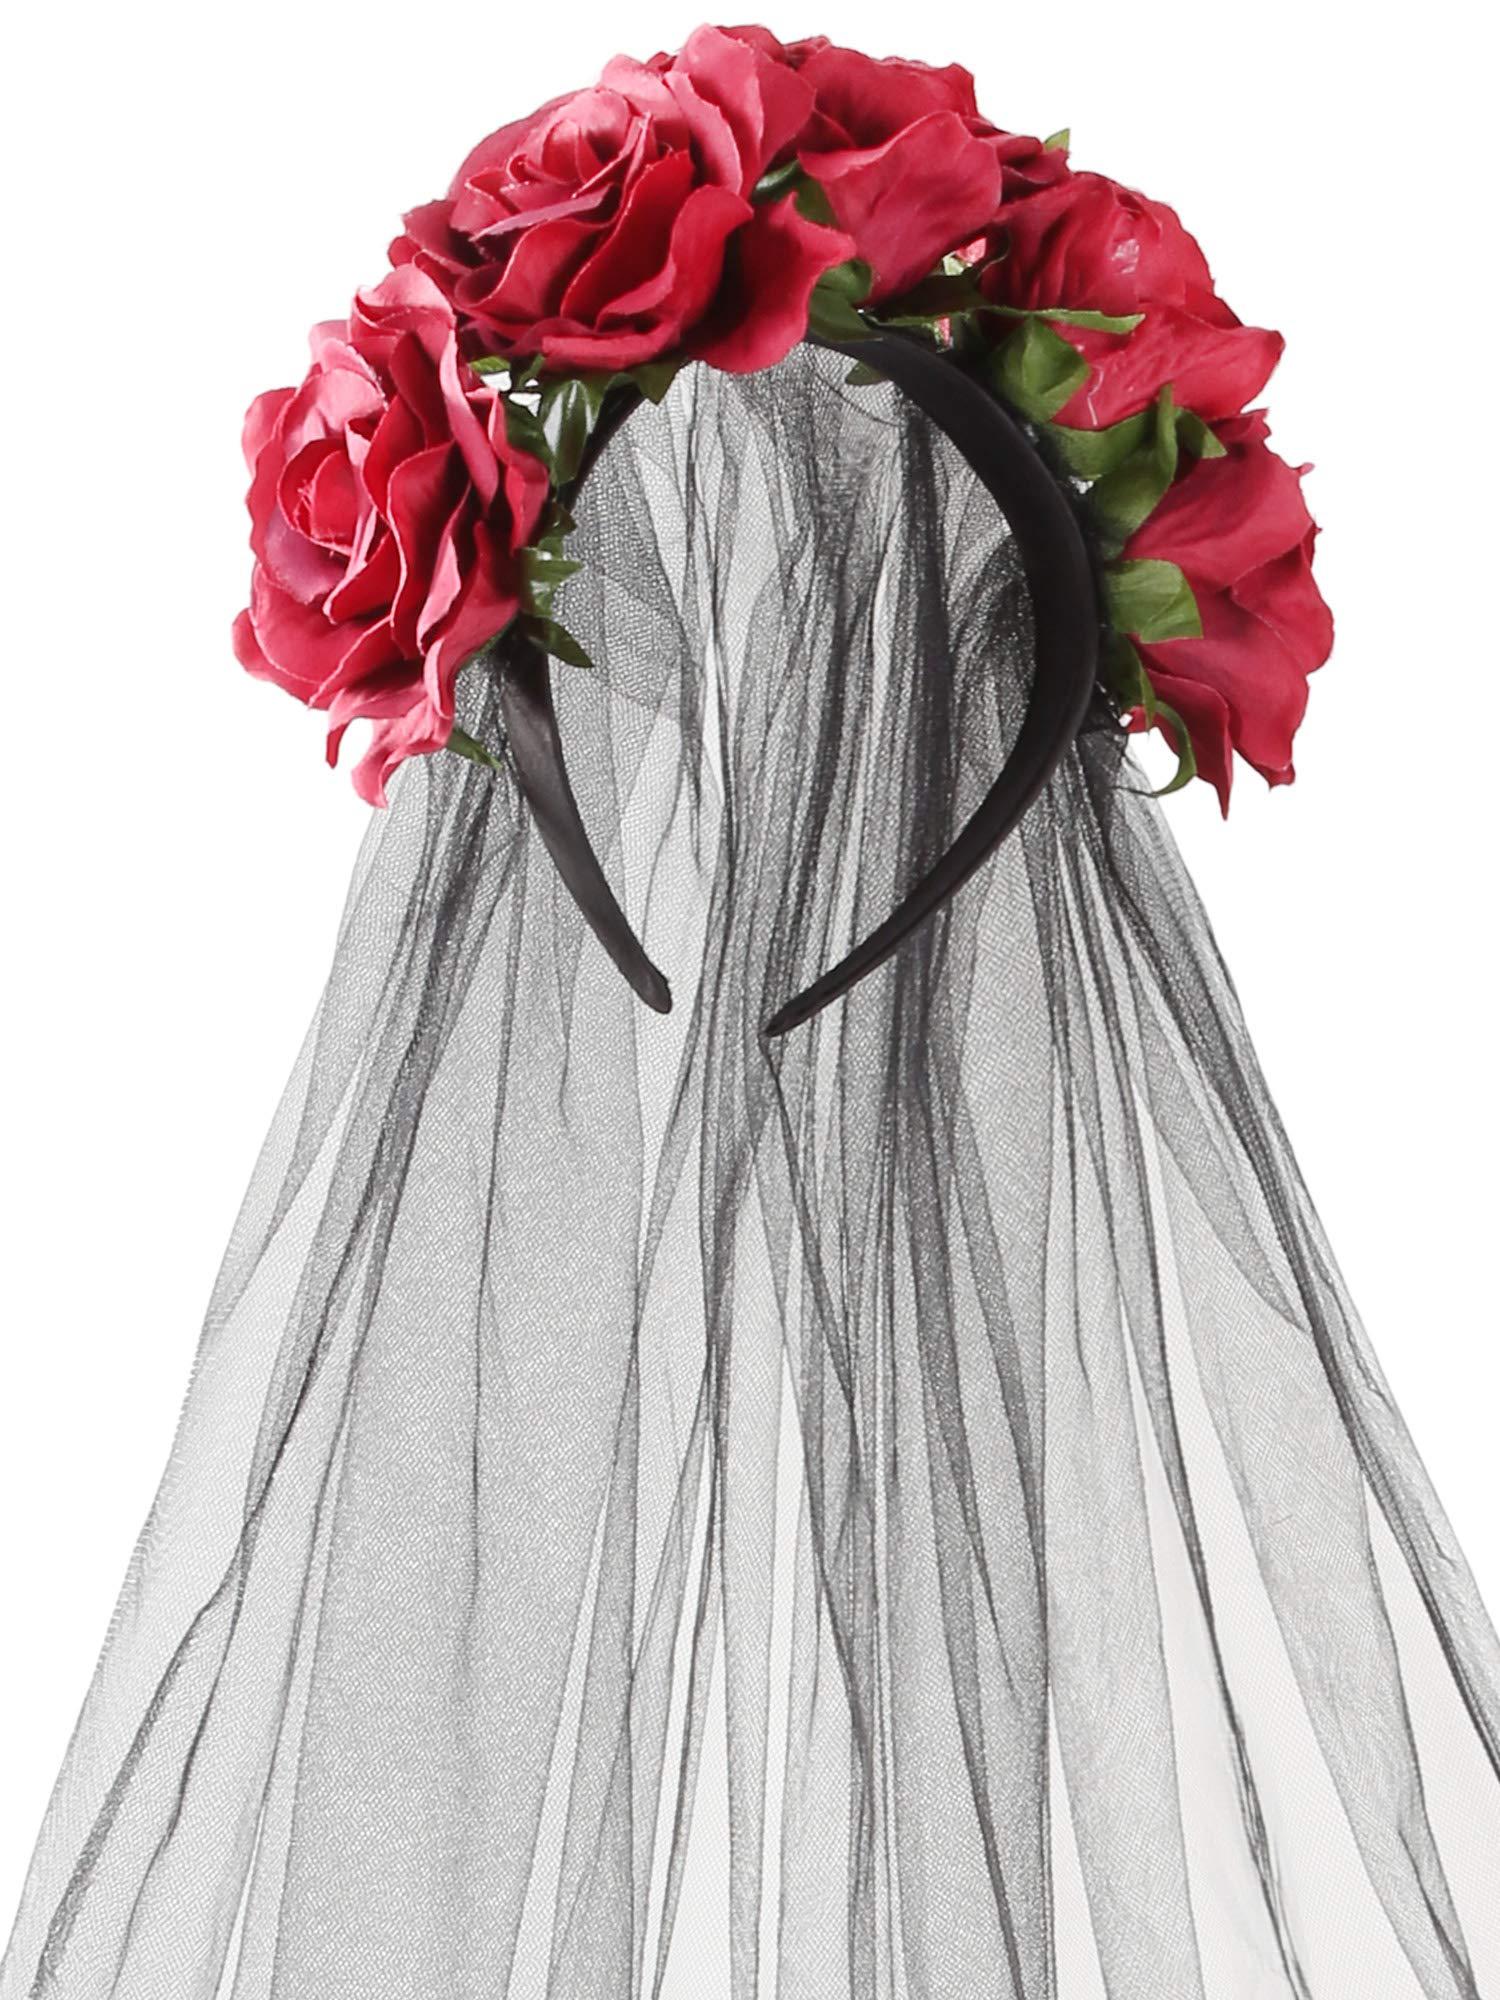 Jovitec Rose Headband Floral Crown Flower Veil Headpiece for Day of The Dead Halloween Costume (Burgundy)